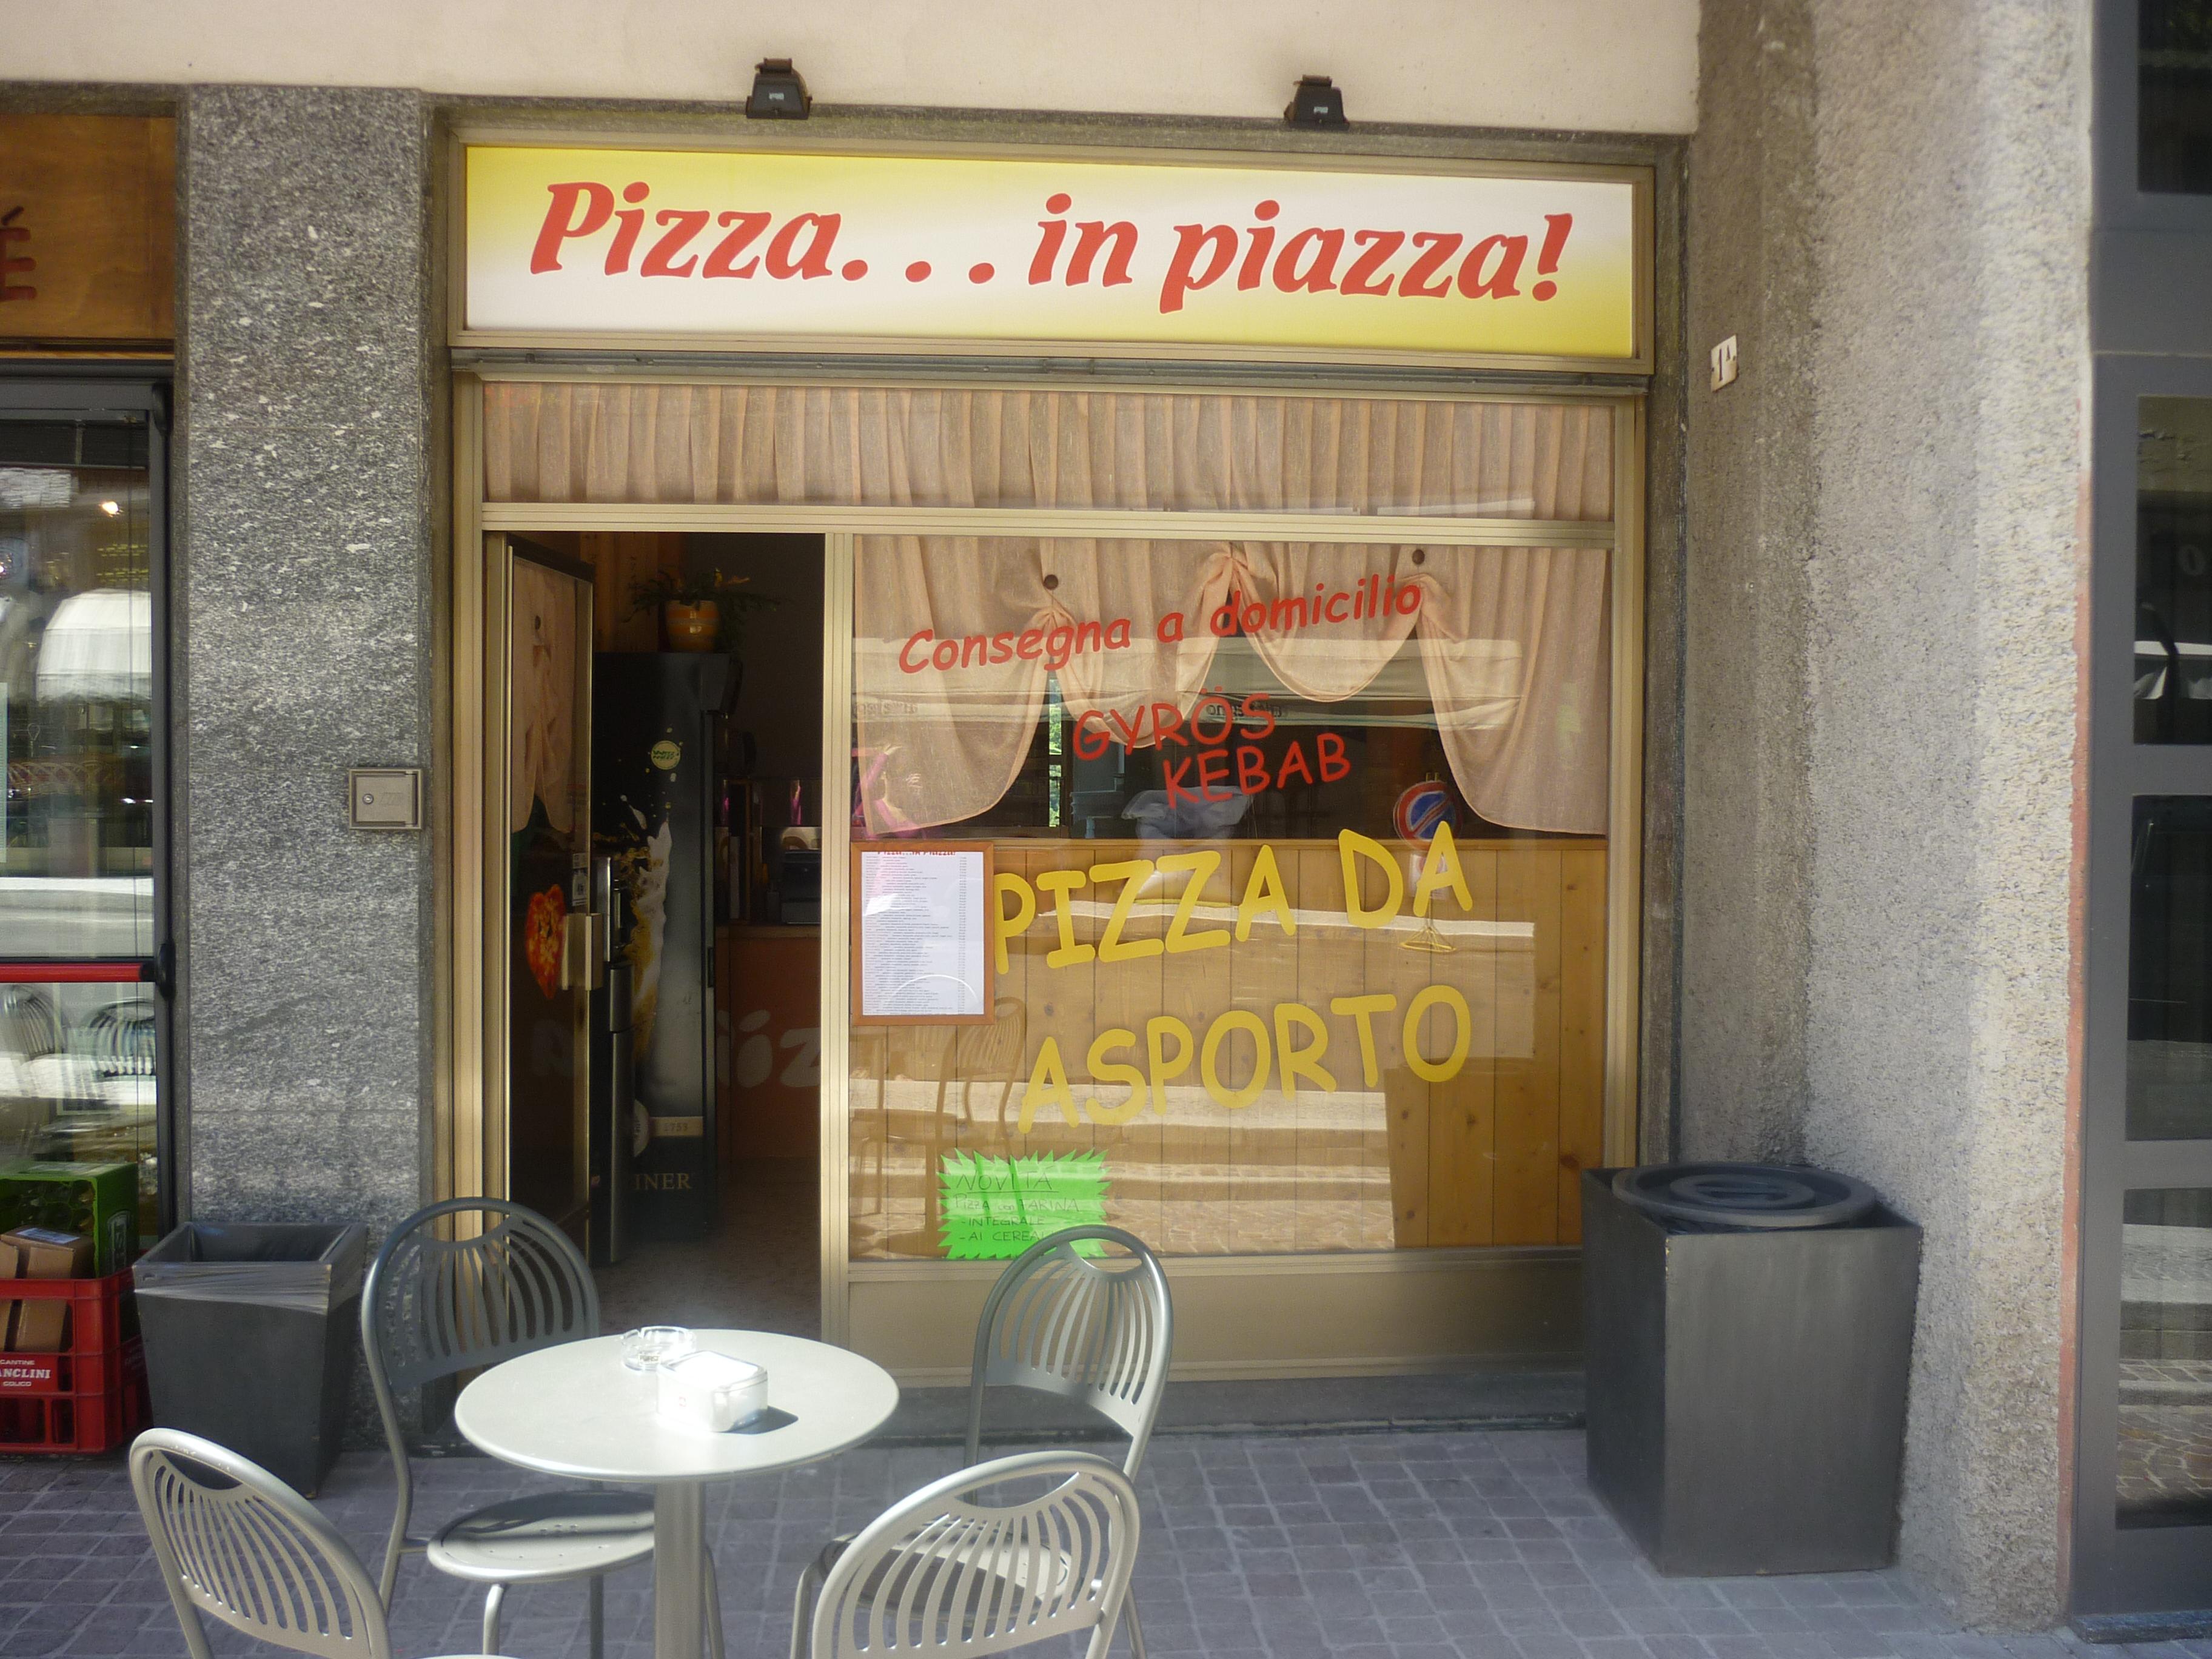 Pizza… in piazza